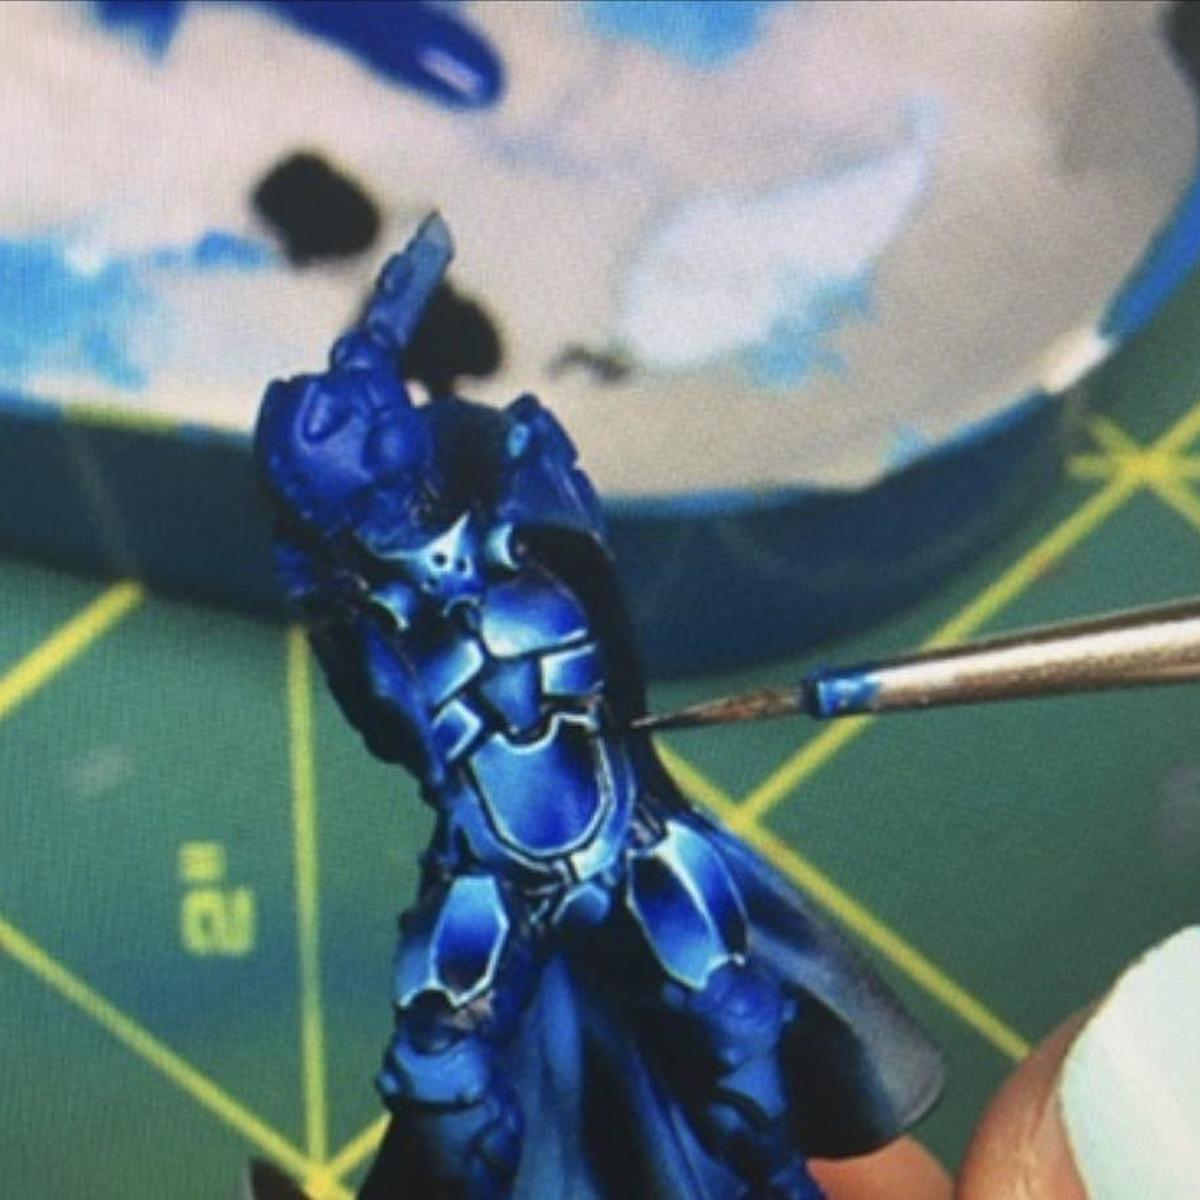 Blue NMM Armor - Infinity Panoceania